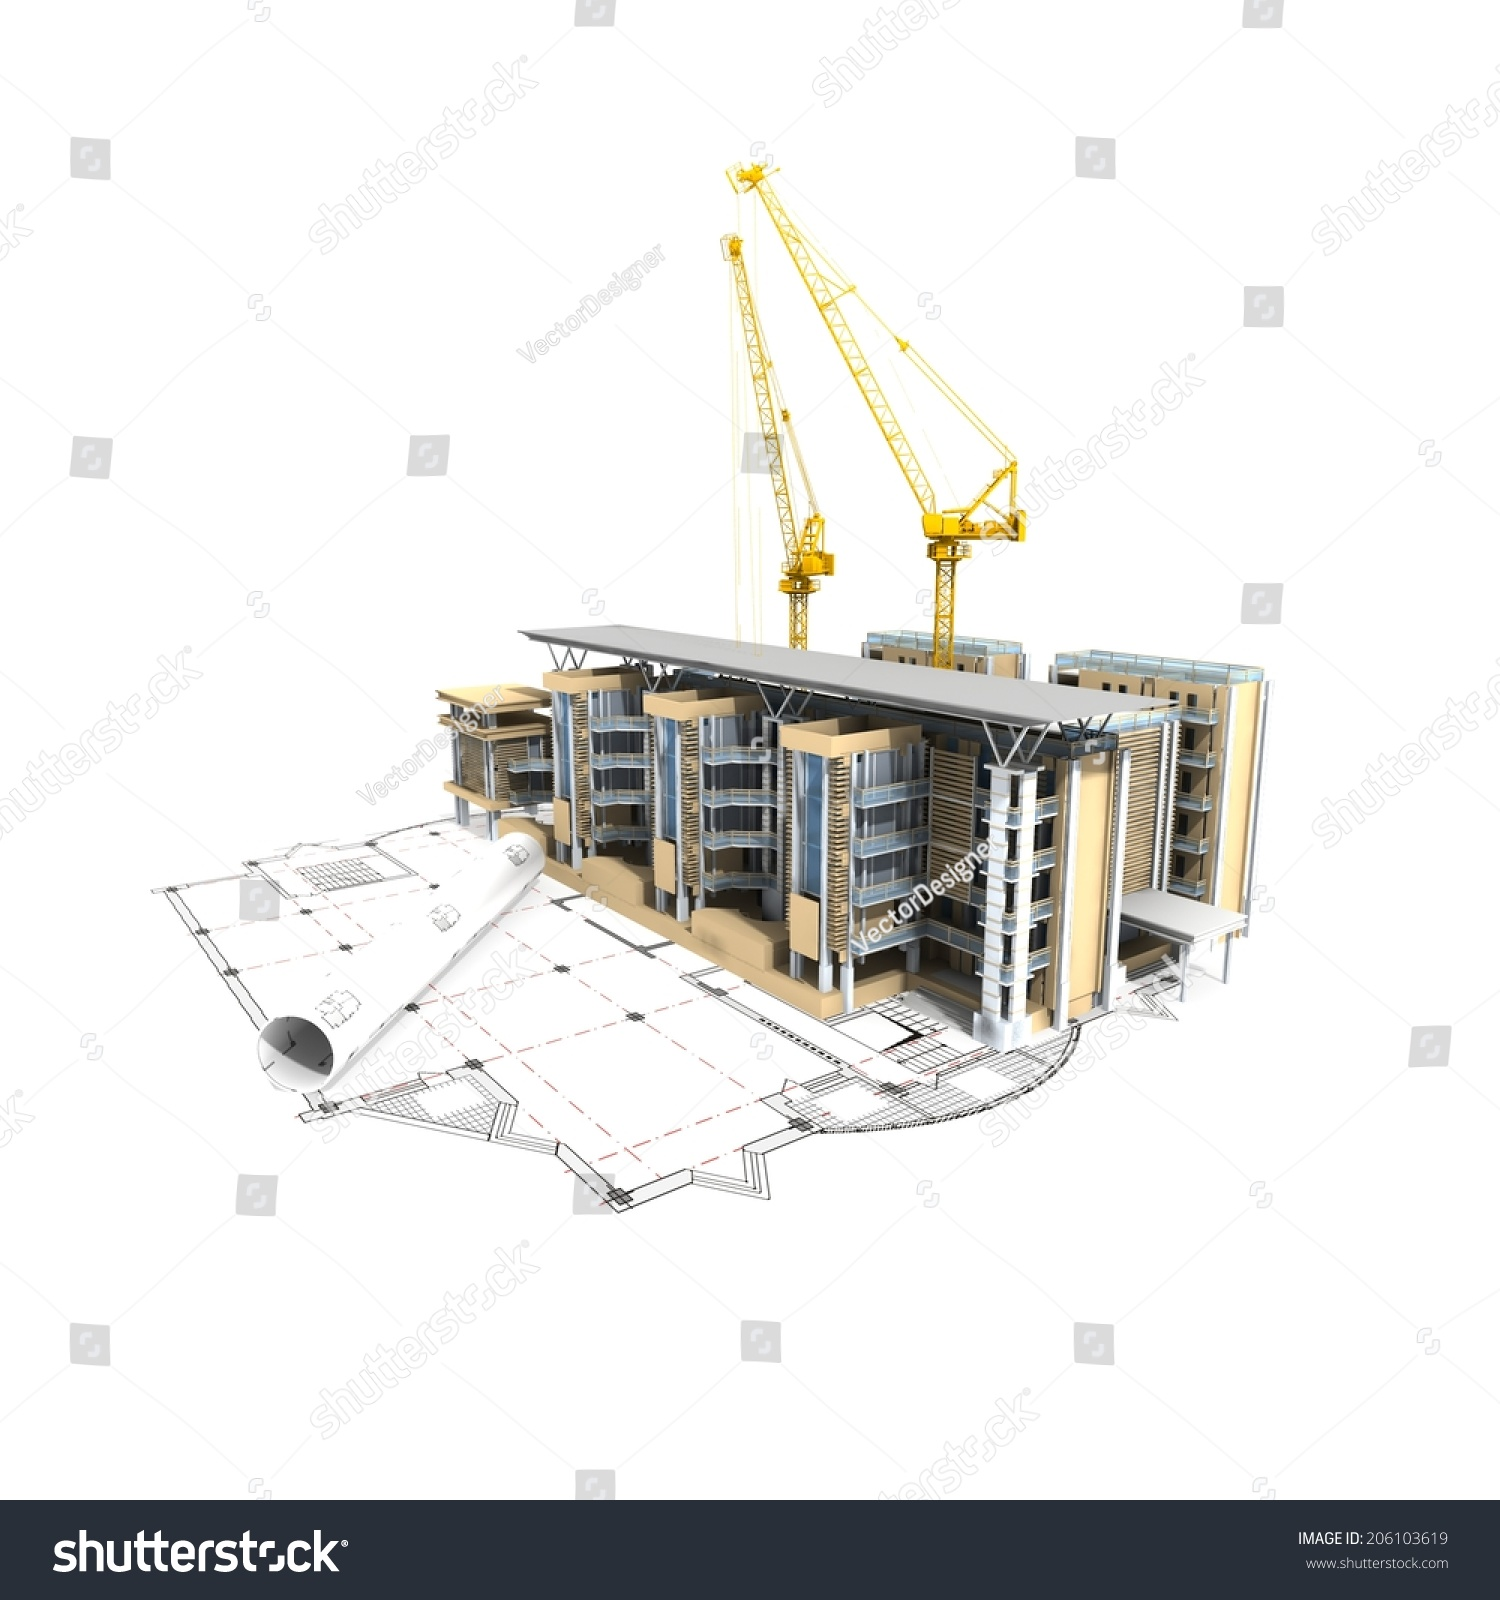 3d Plan Drawing Stock Photo 206103619 Shutterstock